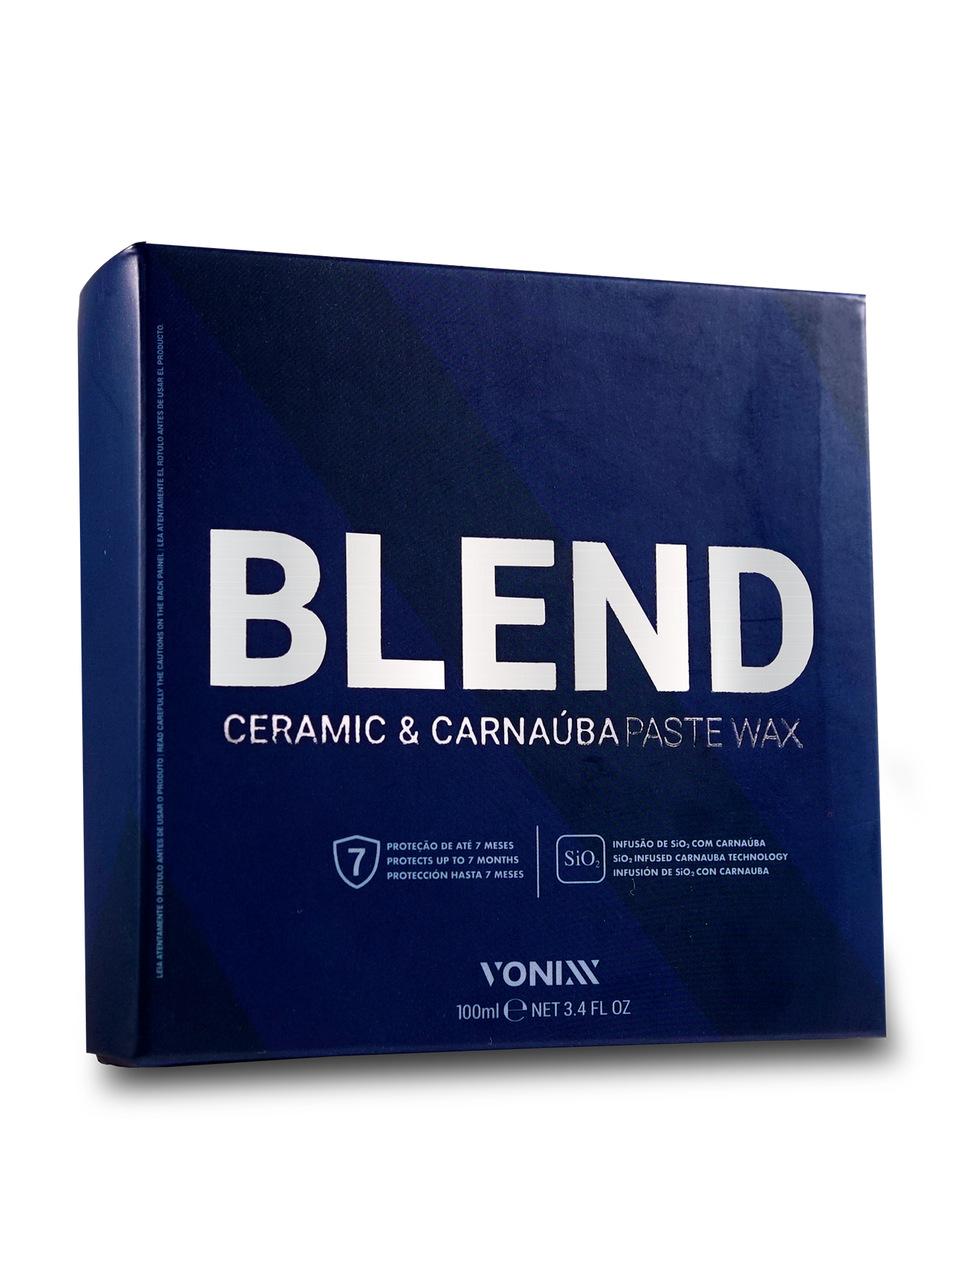 Blend Cera de Carnaúba Sílica 100g Vonixx